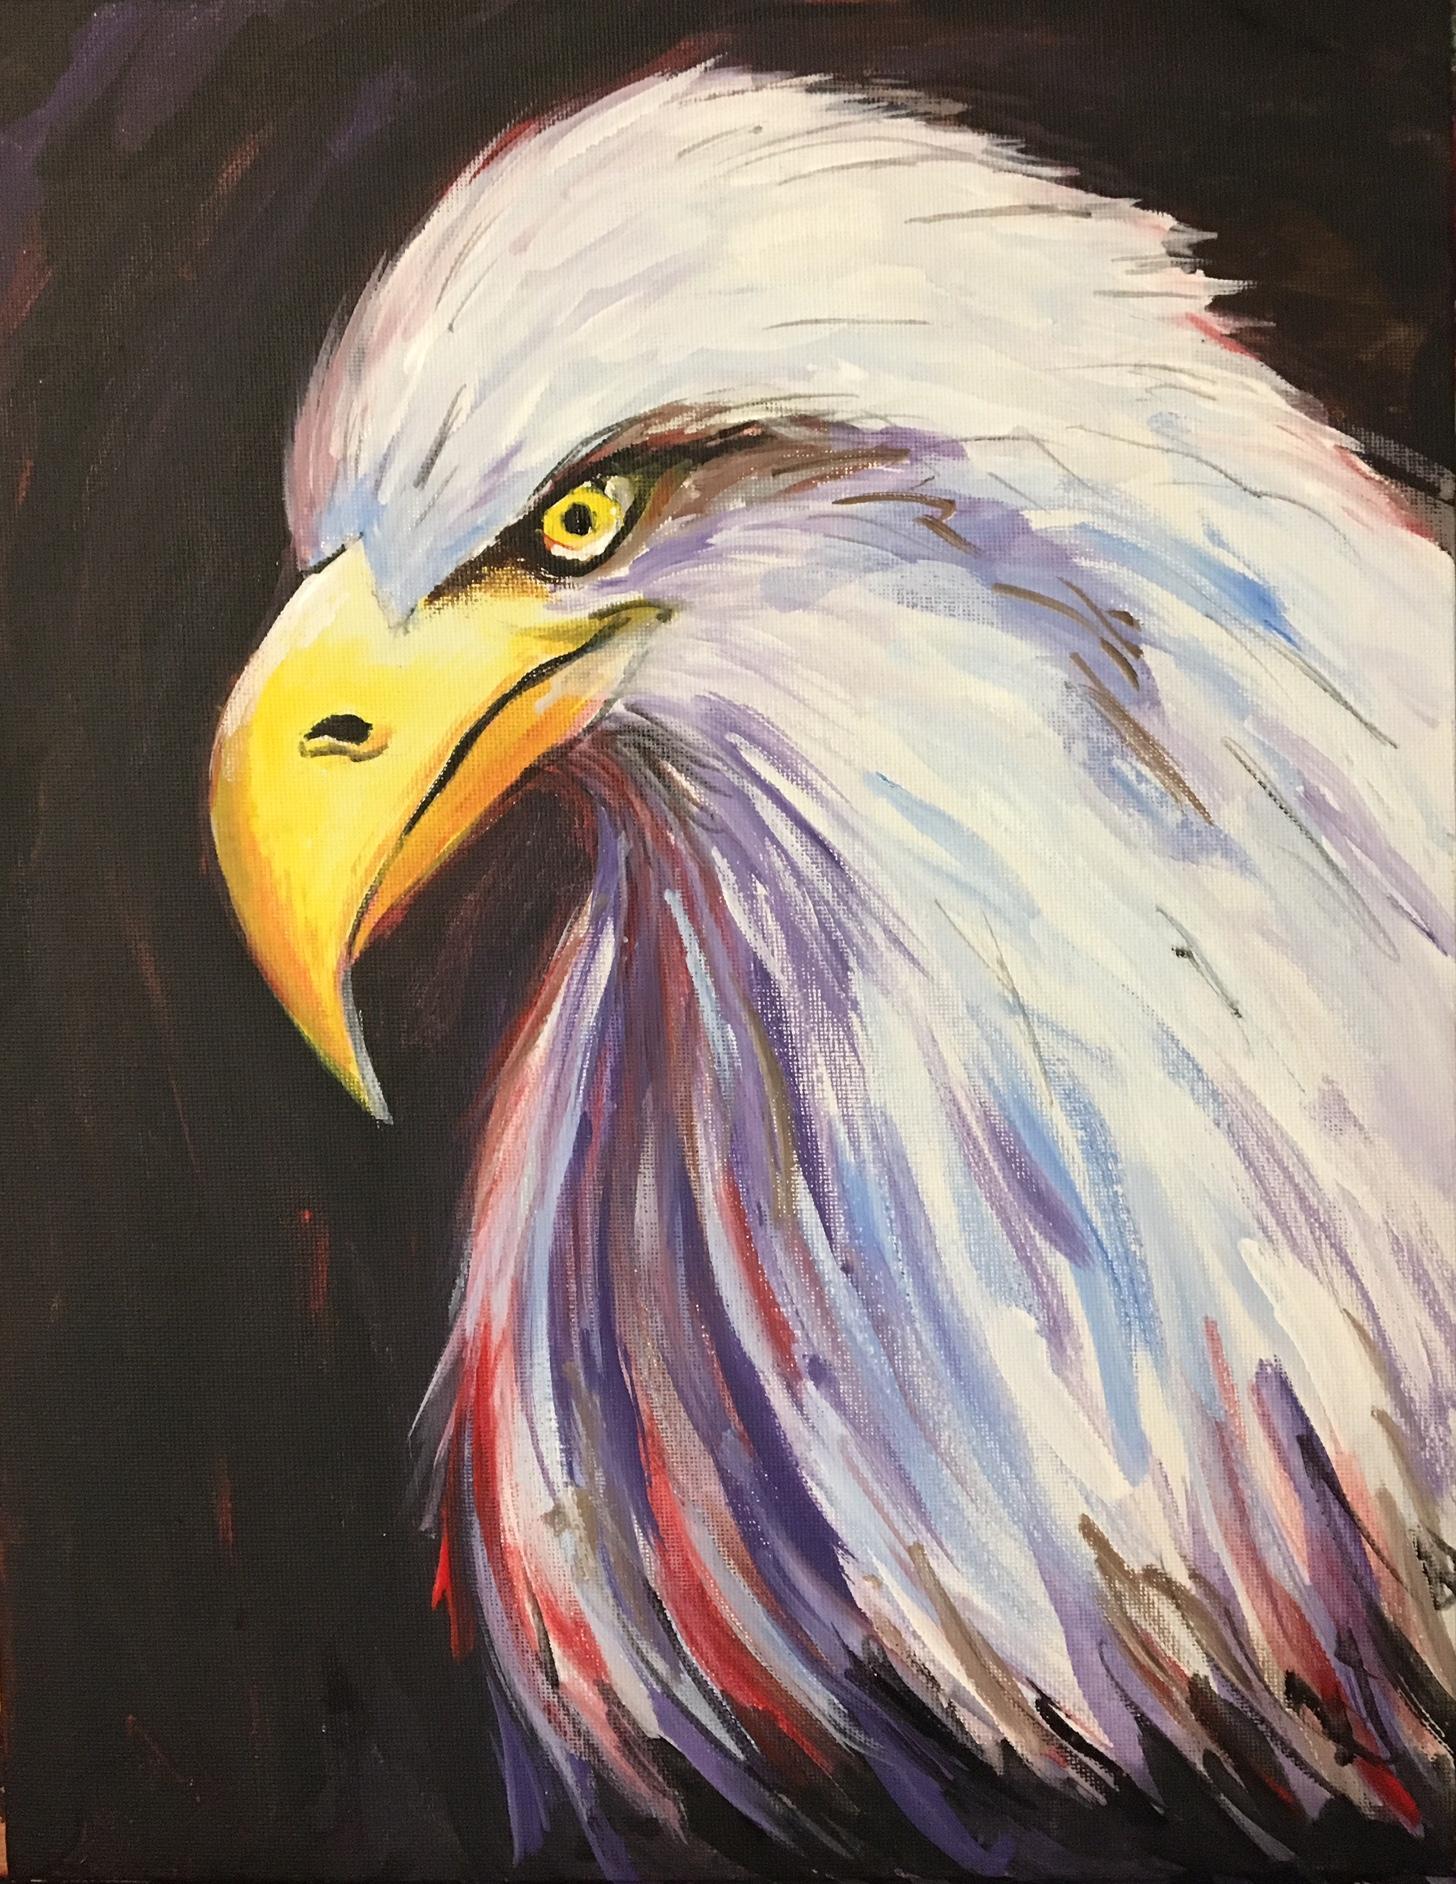 eagle eye - paint-along @ farnsworth house inn, gettysburg - 5 jul